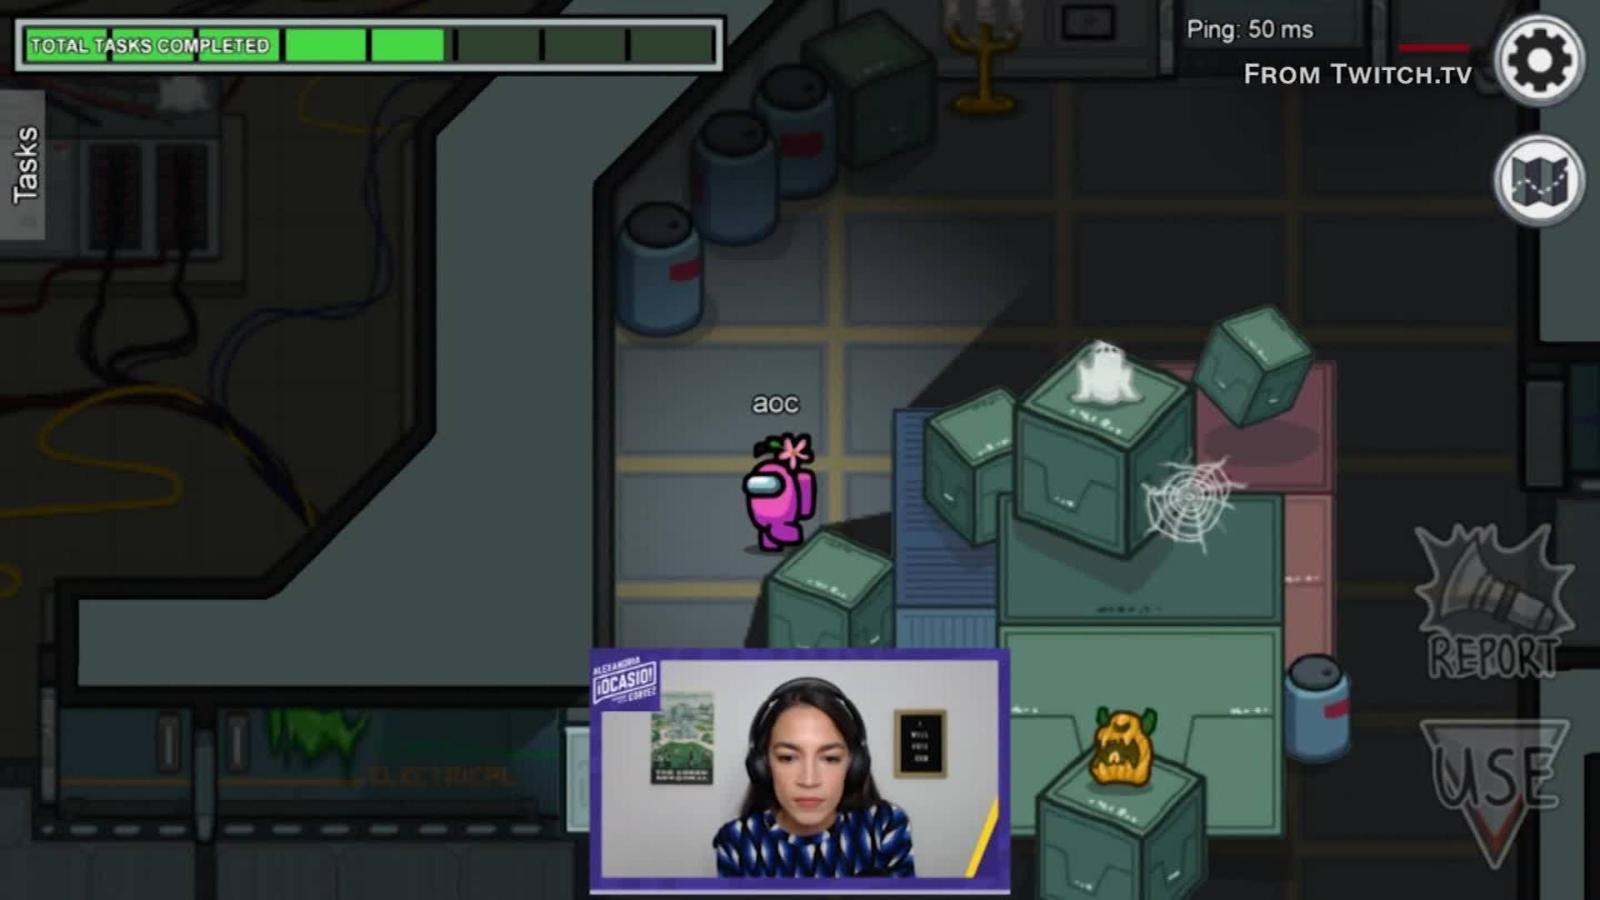 Game On Aoc Streams Viral Hit Game Among Us Cnn Video